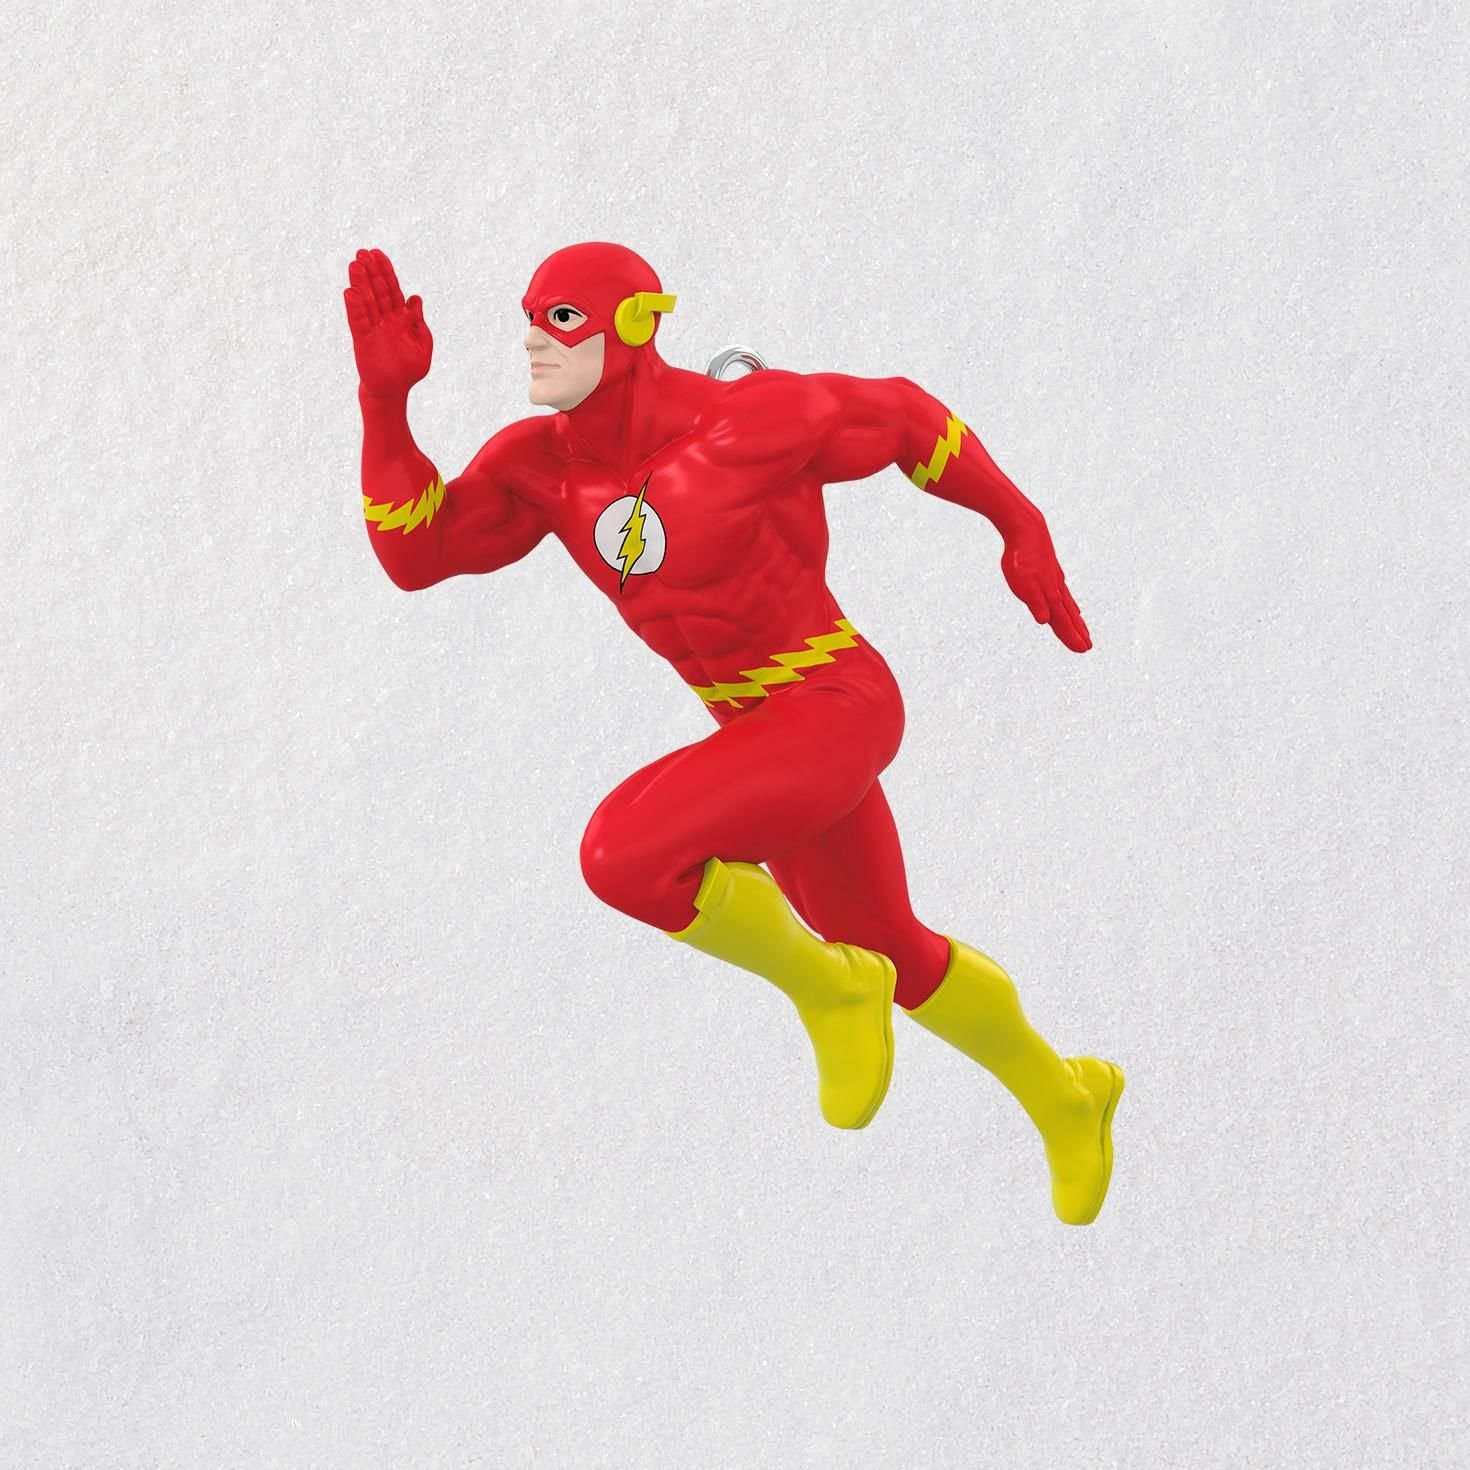 Hallmark Keepsake Mini Christmas Ornament 2018 Year Dated, DC Comics Justice League The Flash Miniature, 1.3'' by Hallmark